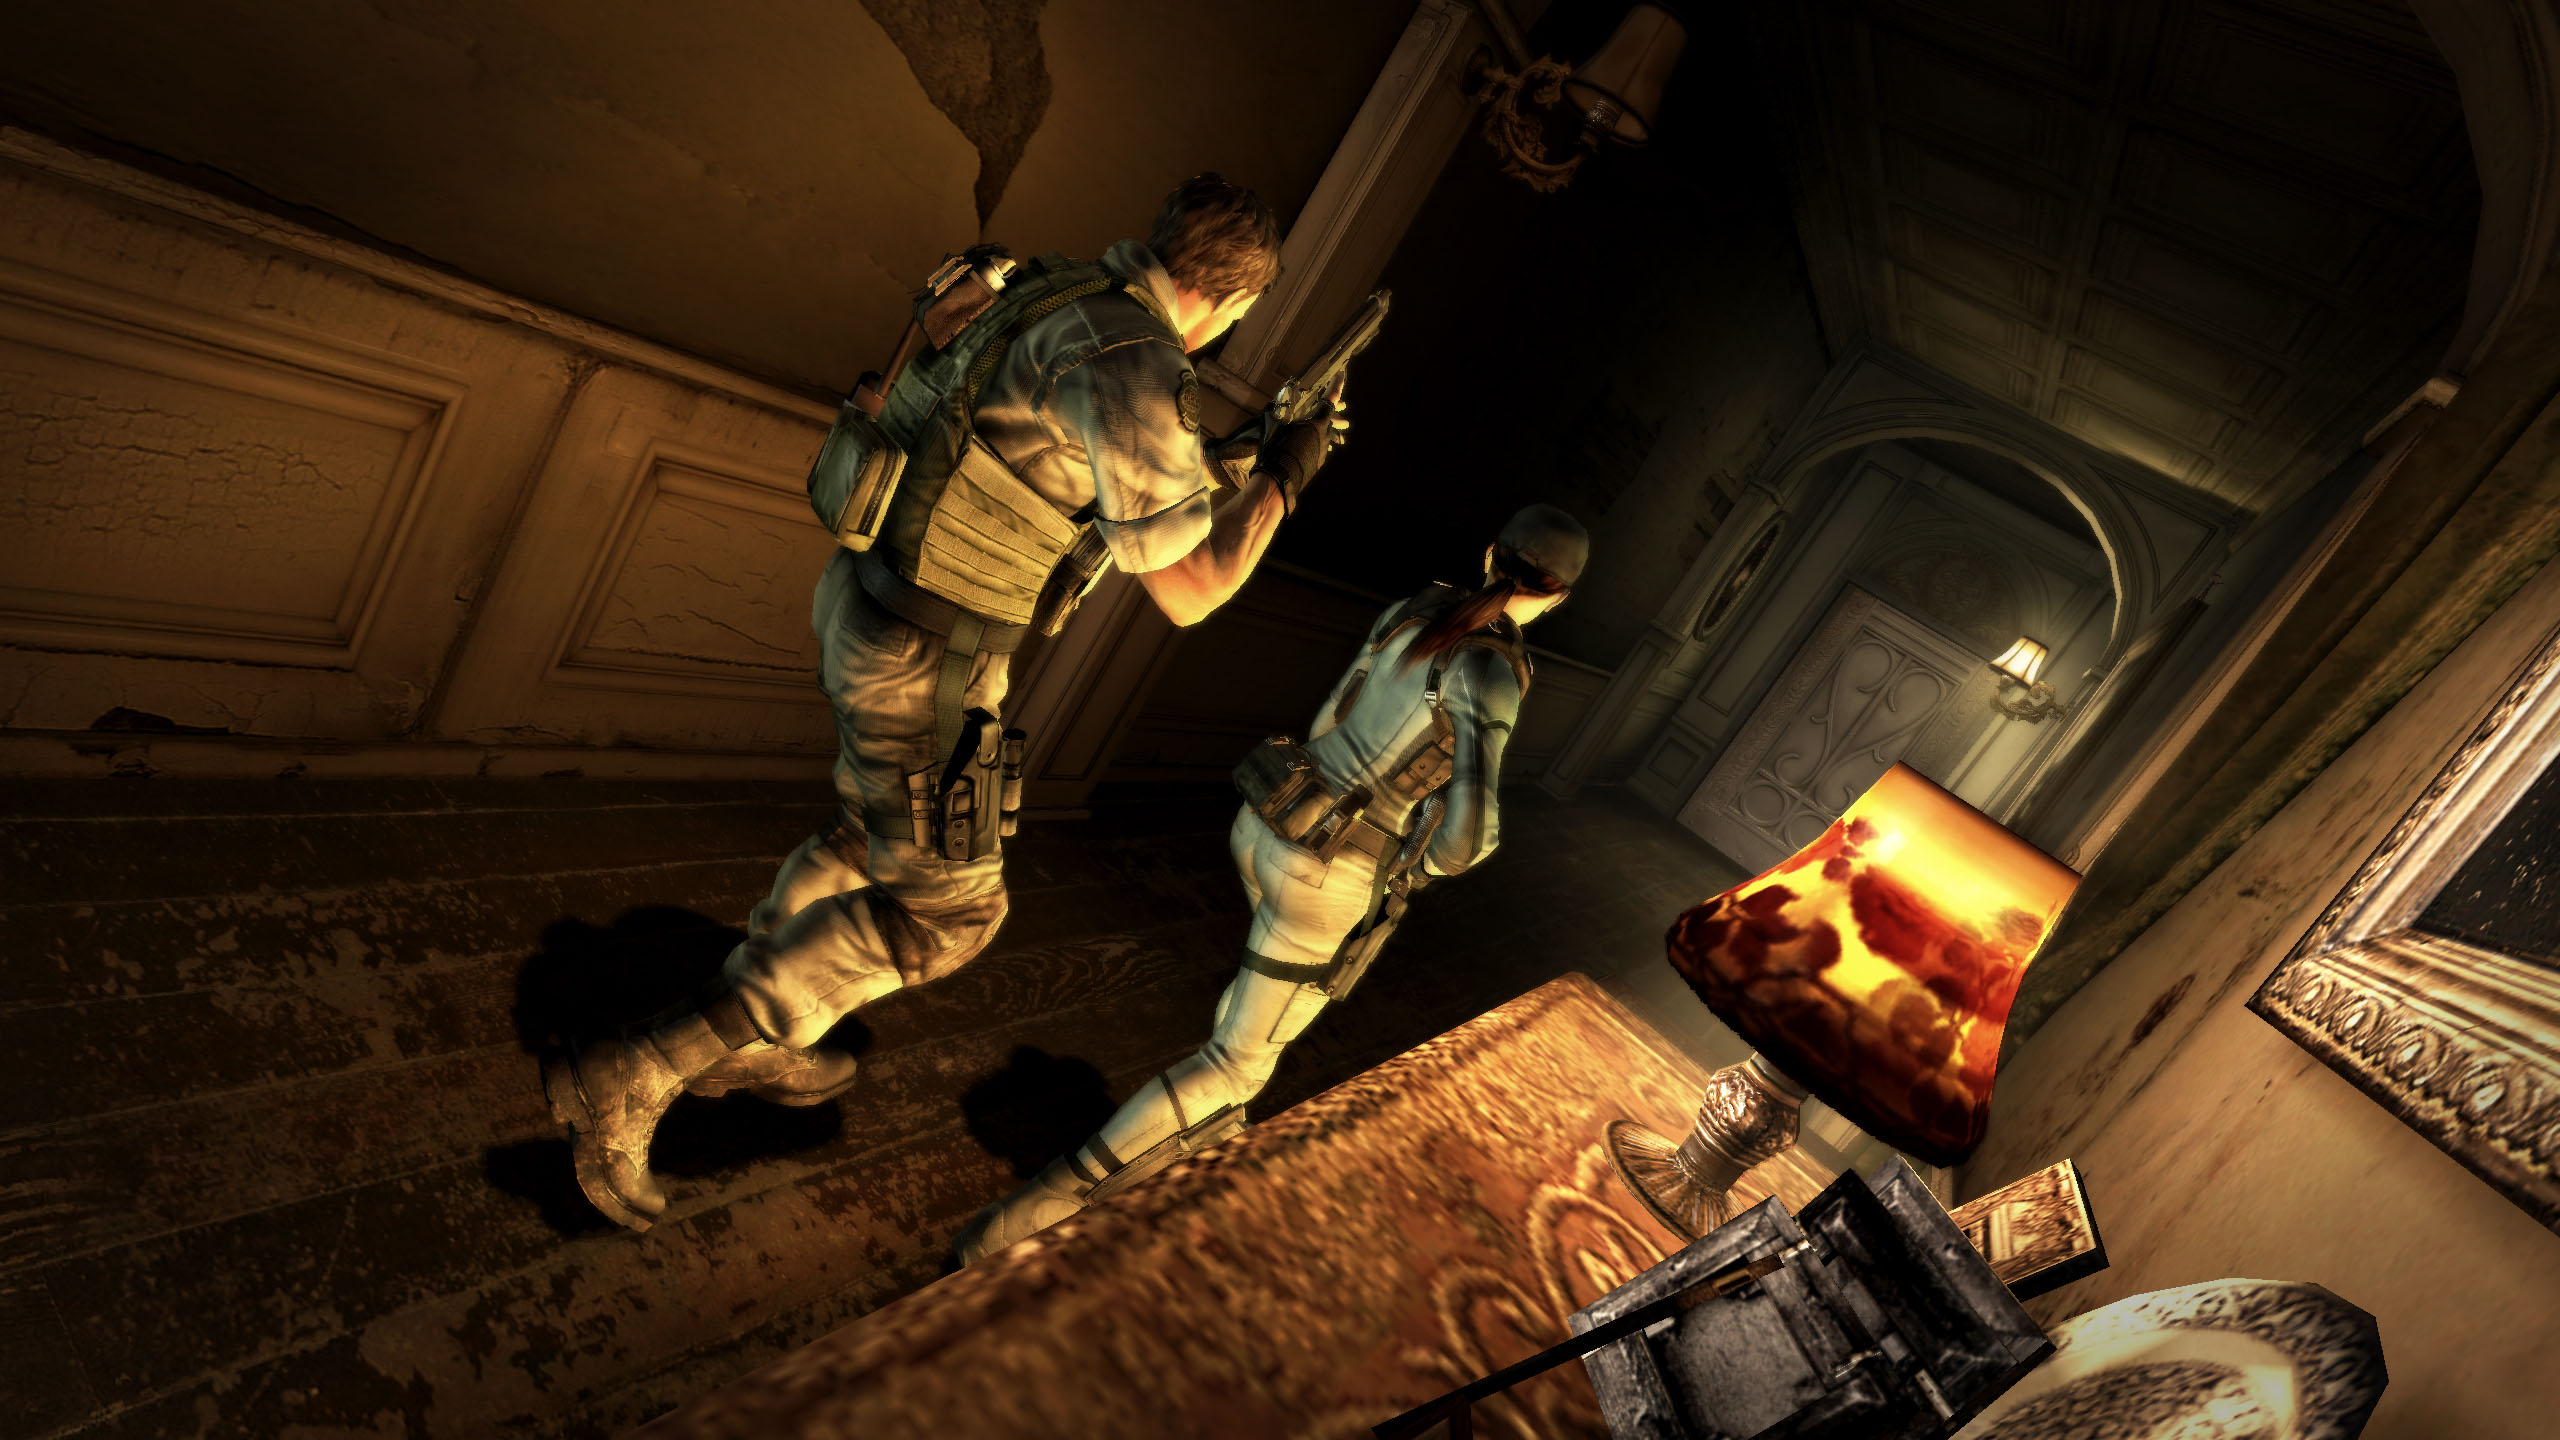 Resident Evil 5 Filme Download Tpb Torrent